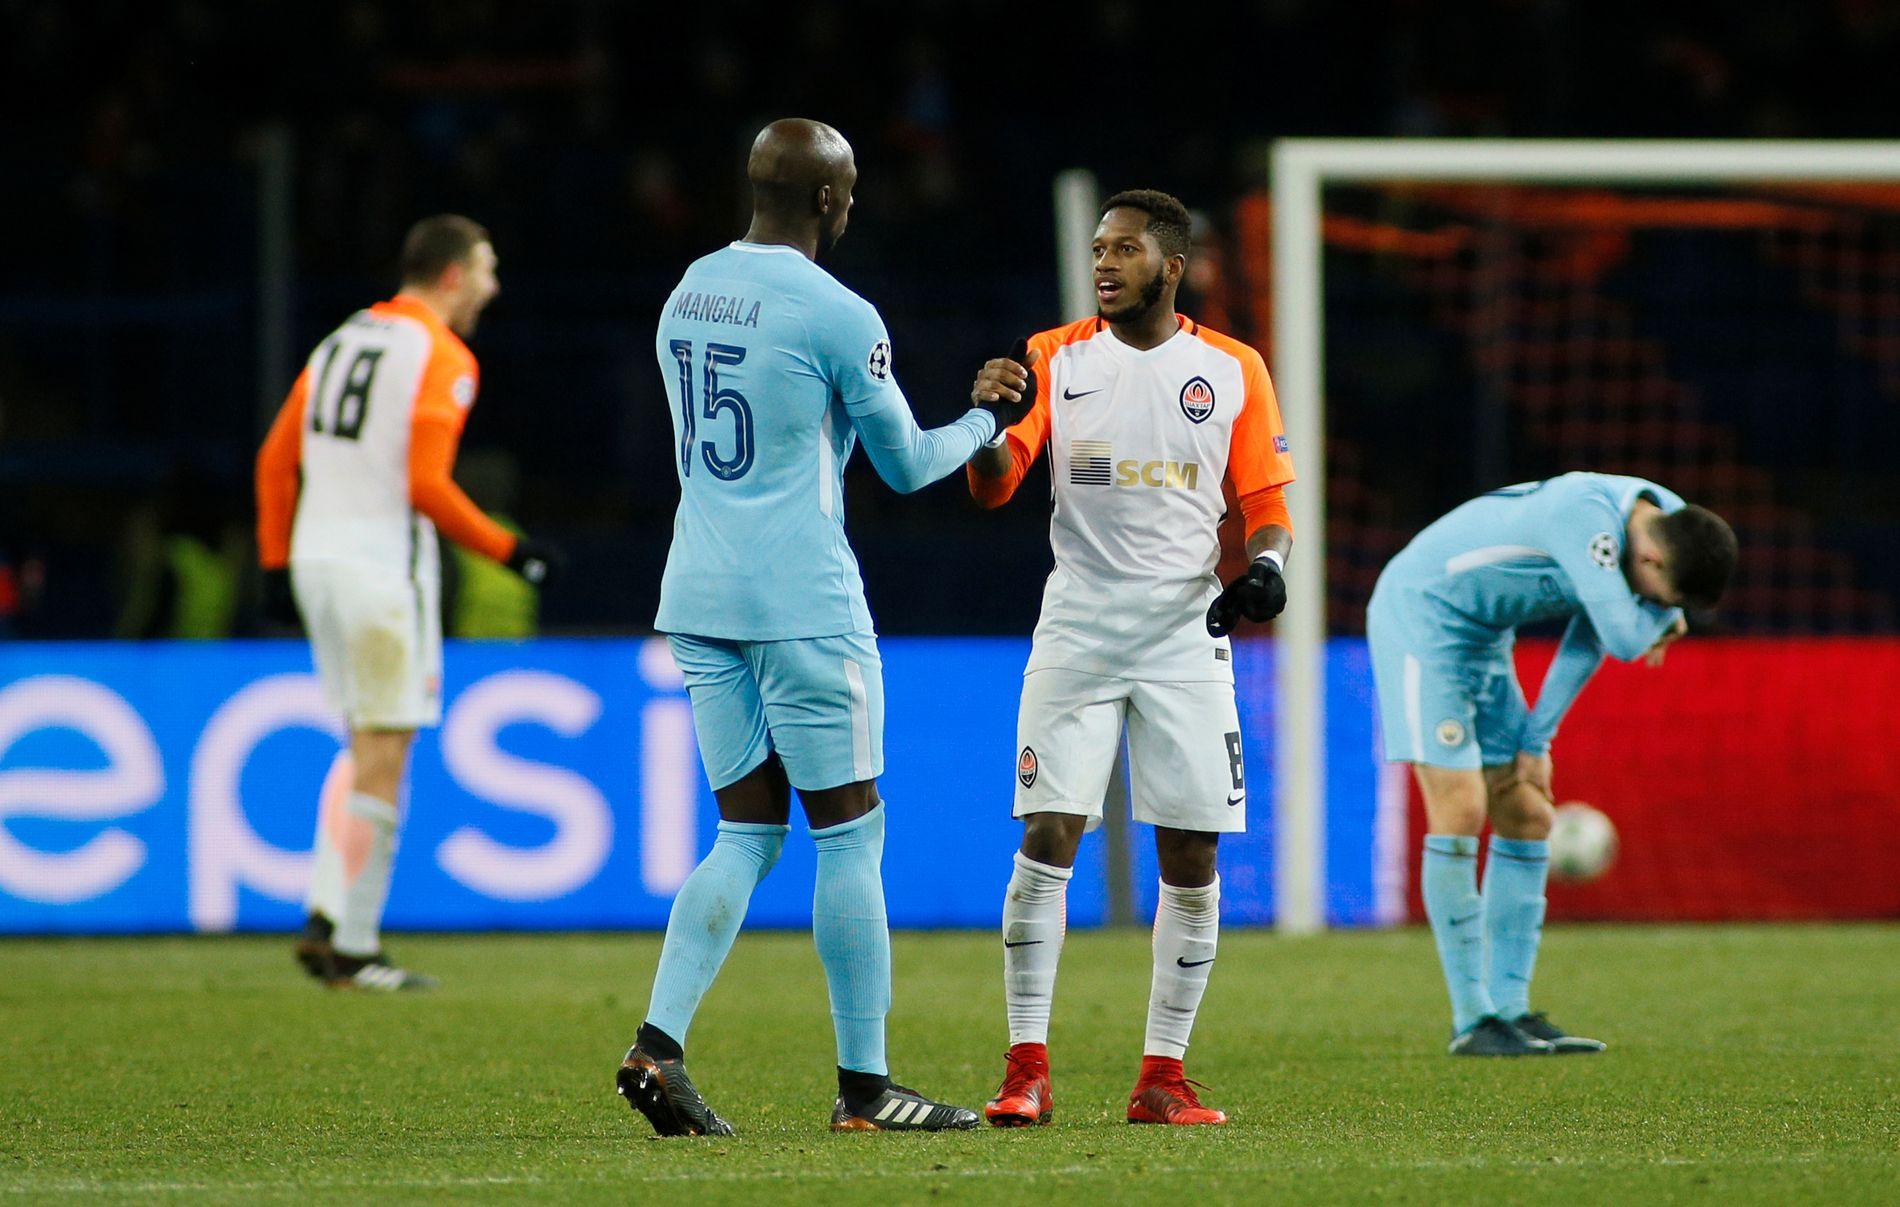 CITY-AKTUELL: Fred (t.h.), som her takket Manchester City-spiller Eliaquim Mangala for kampen i Champions League denne høsten, kan være på vei til de lyseblå.